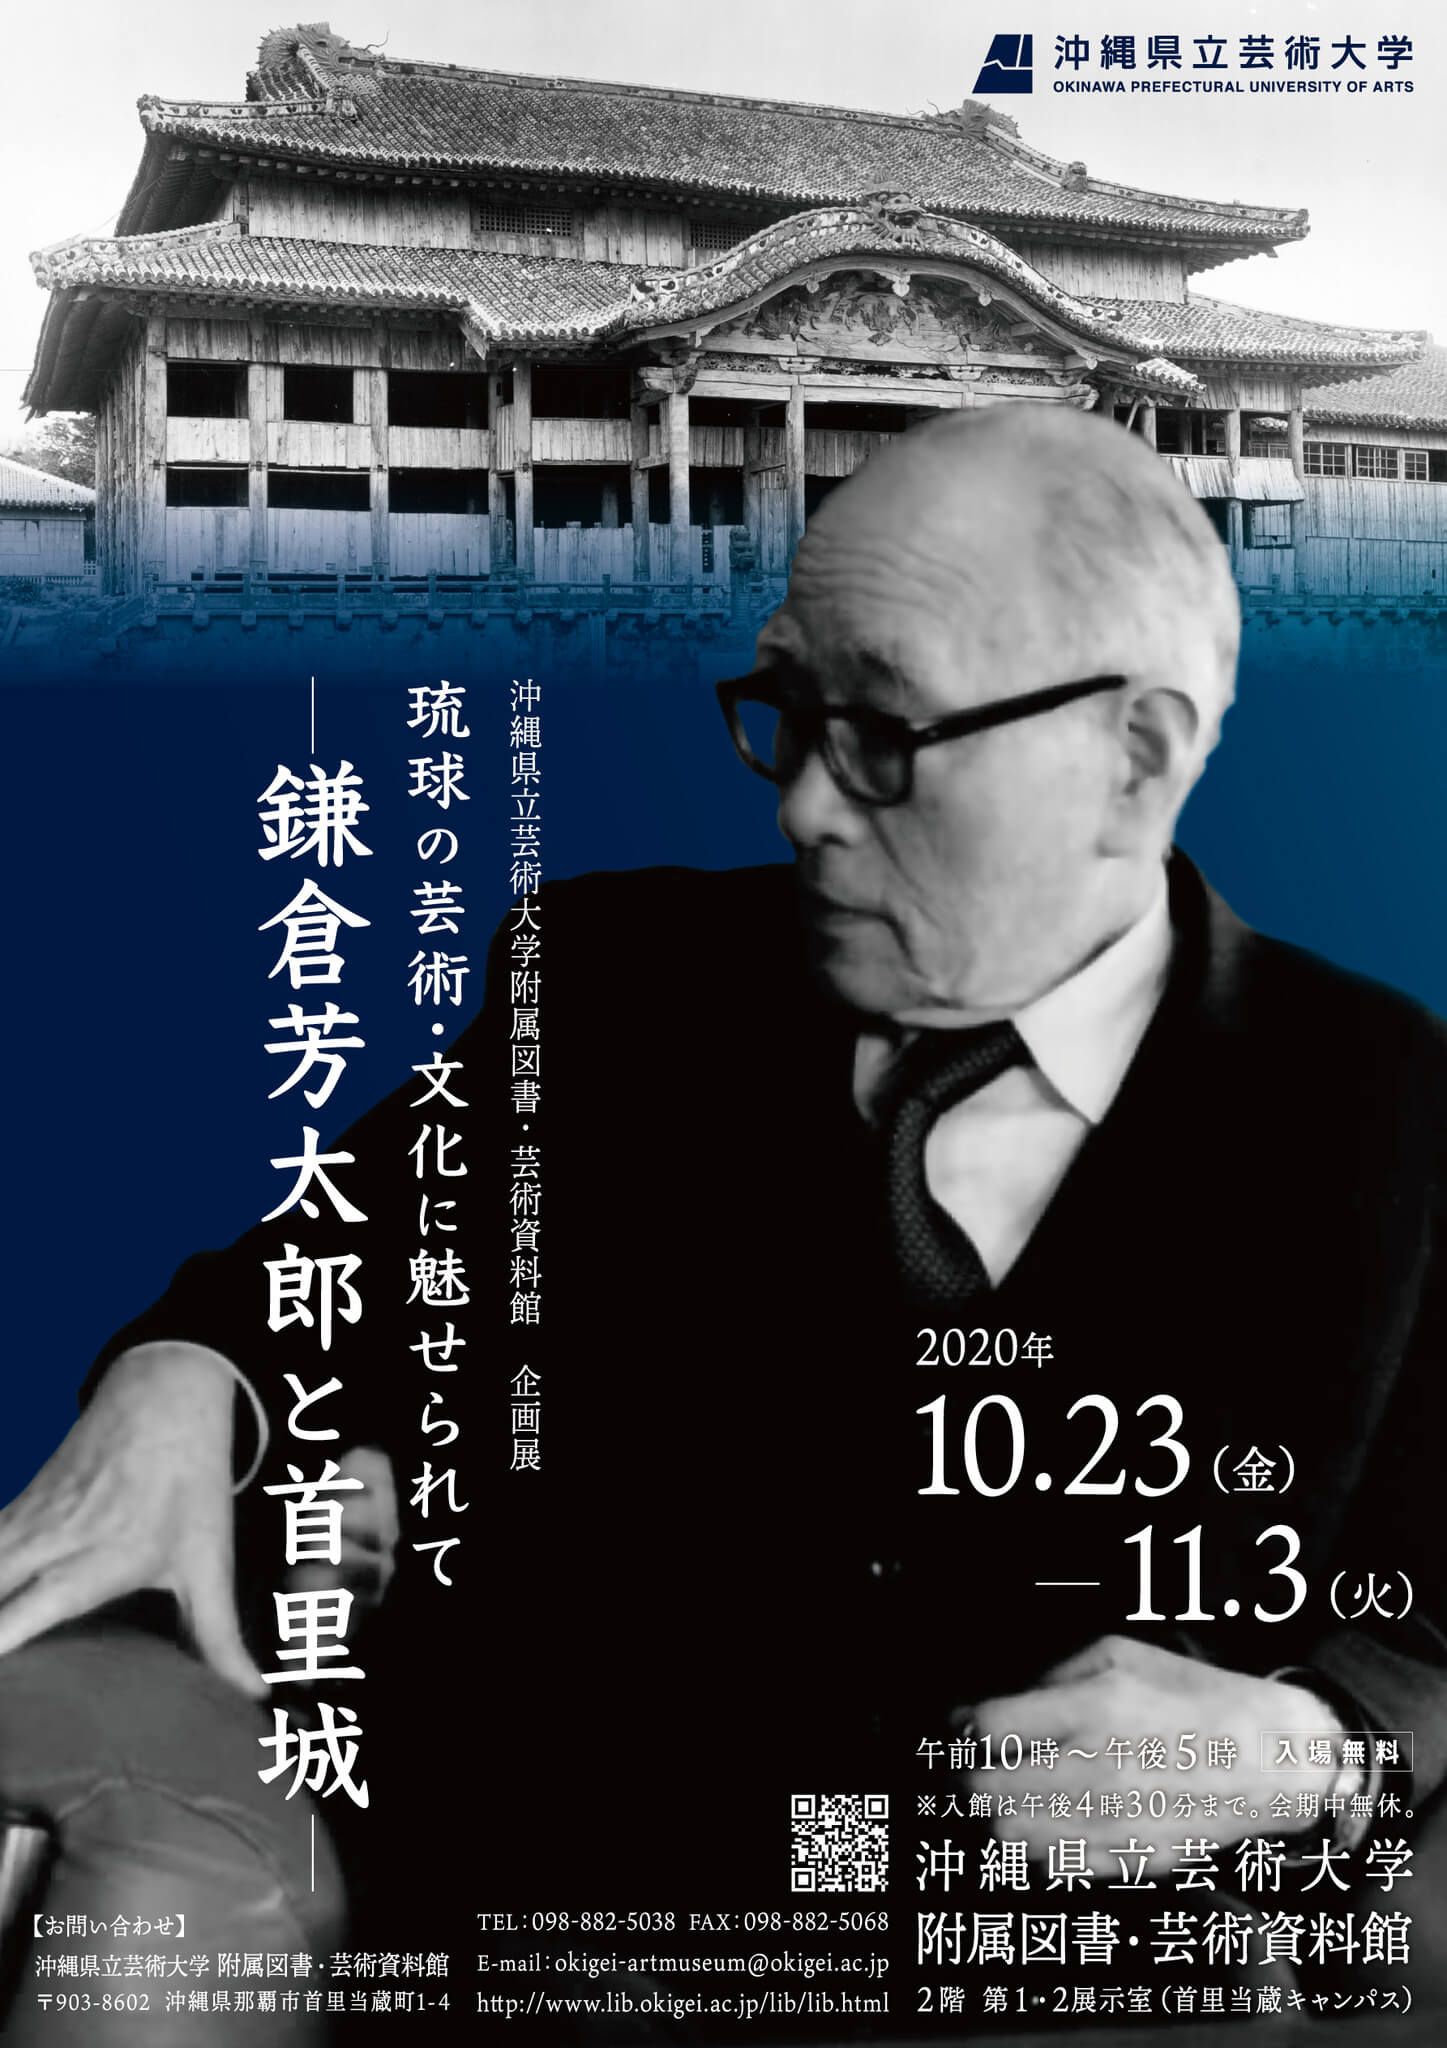 http://www.okigei.ac.jp/wp-content/uploads/2020/09/kamakura2020_new.jpg